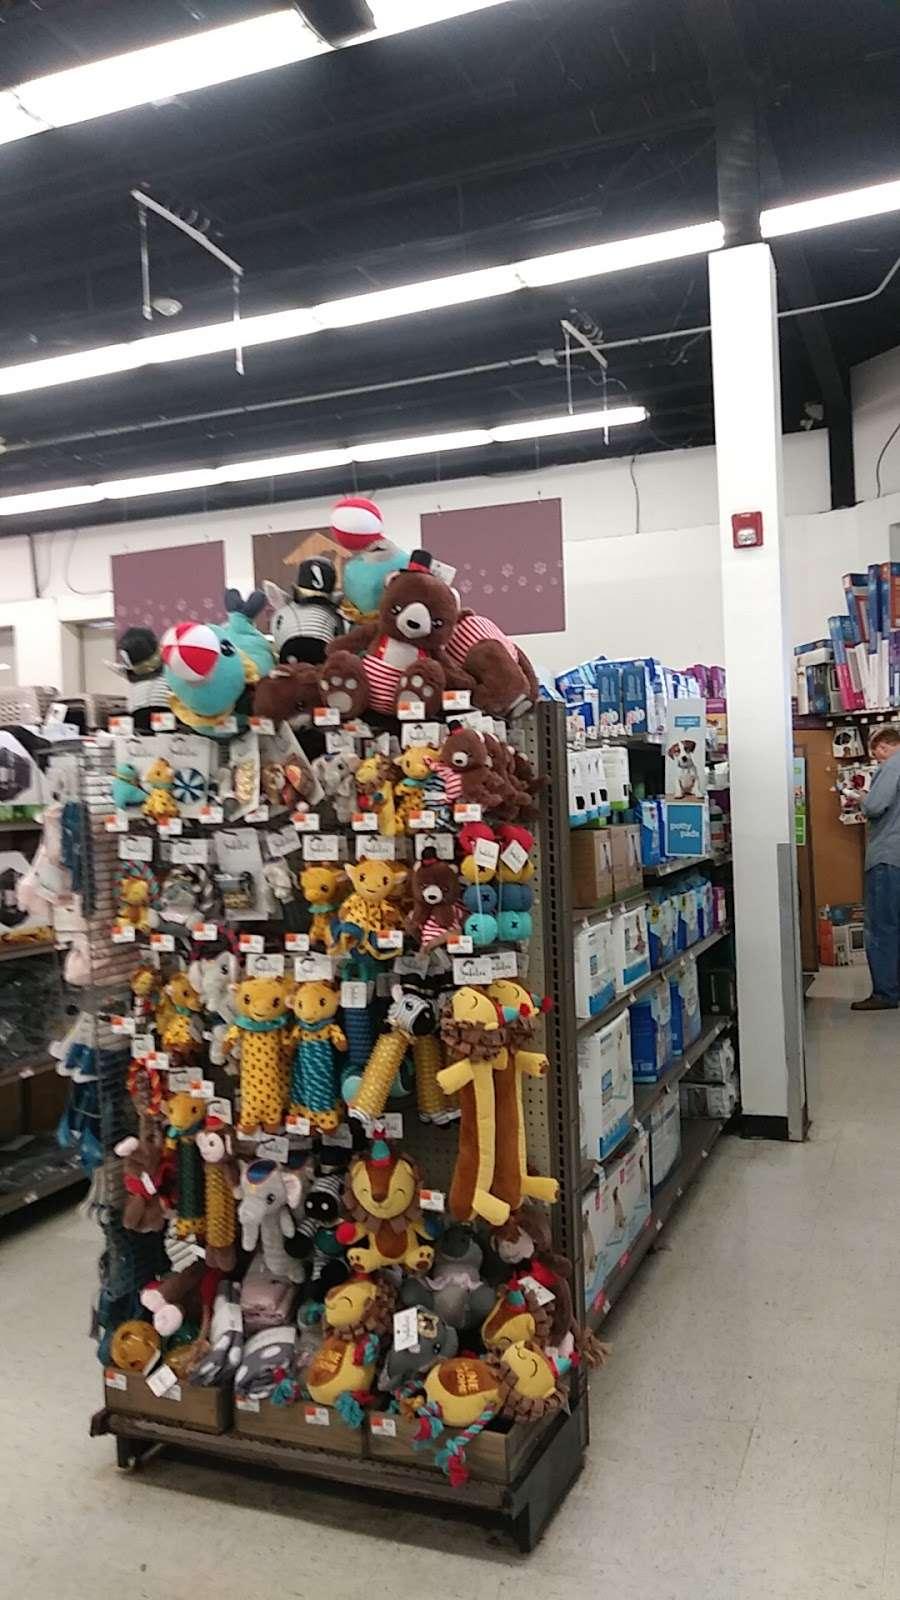 Petco Animal Supplies - store    Photo 6 of 10   Address: 780 Rte 3 West, Clifton, NJ 07012, USA   Phone: (973) 472-3344